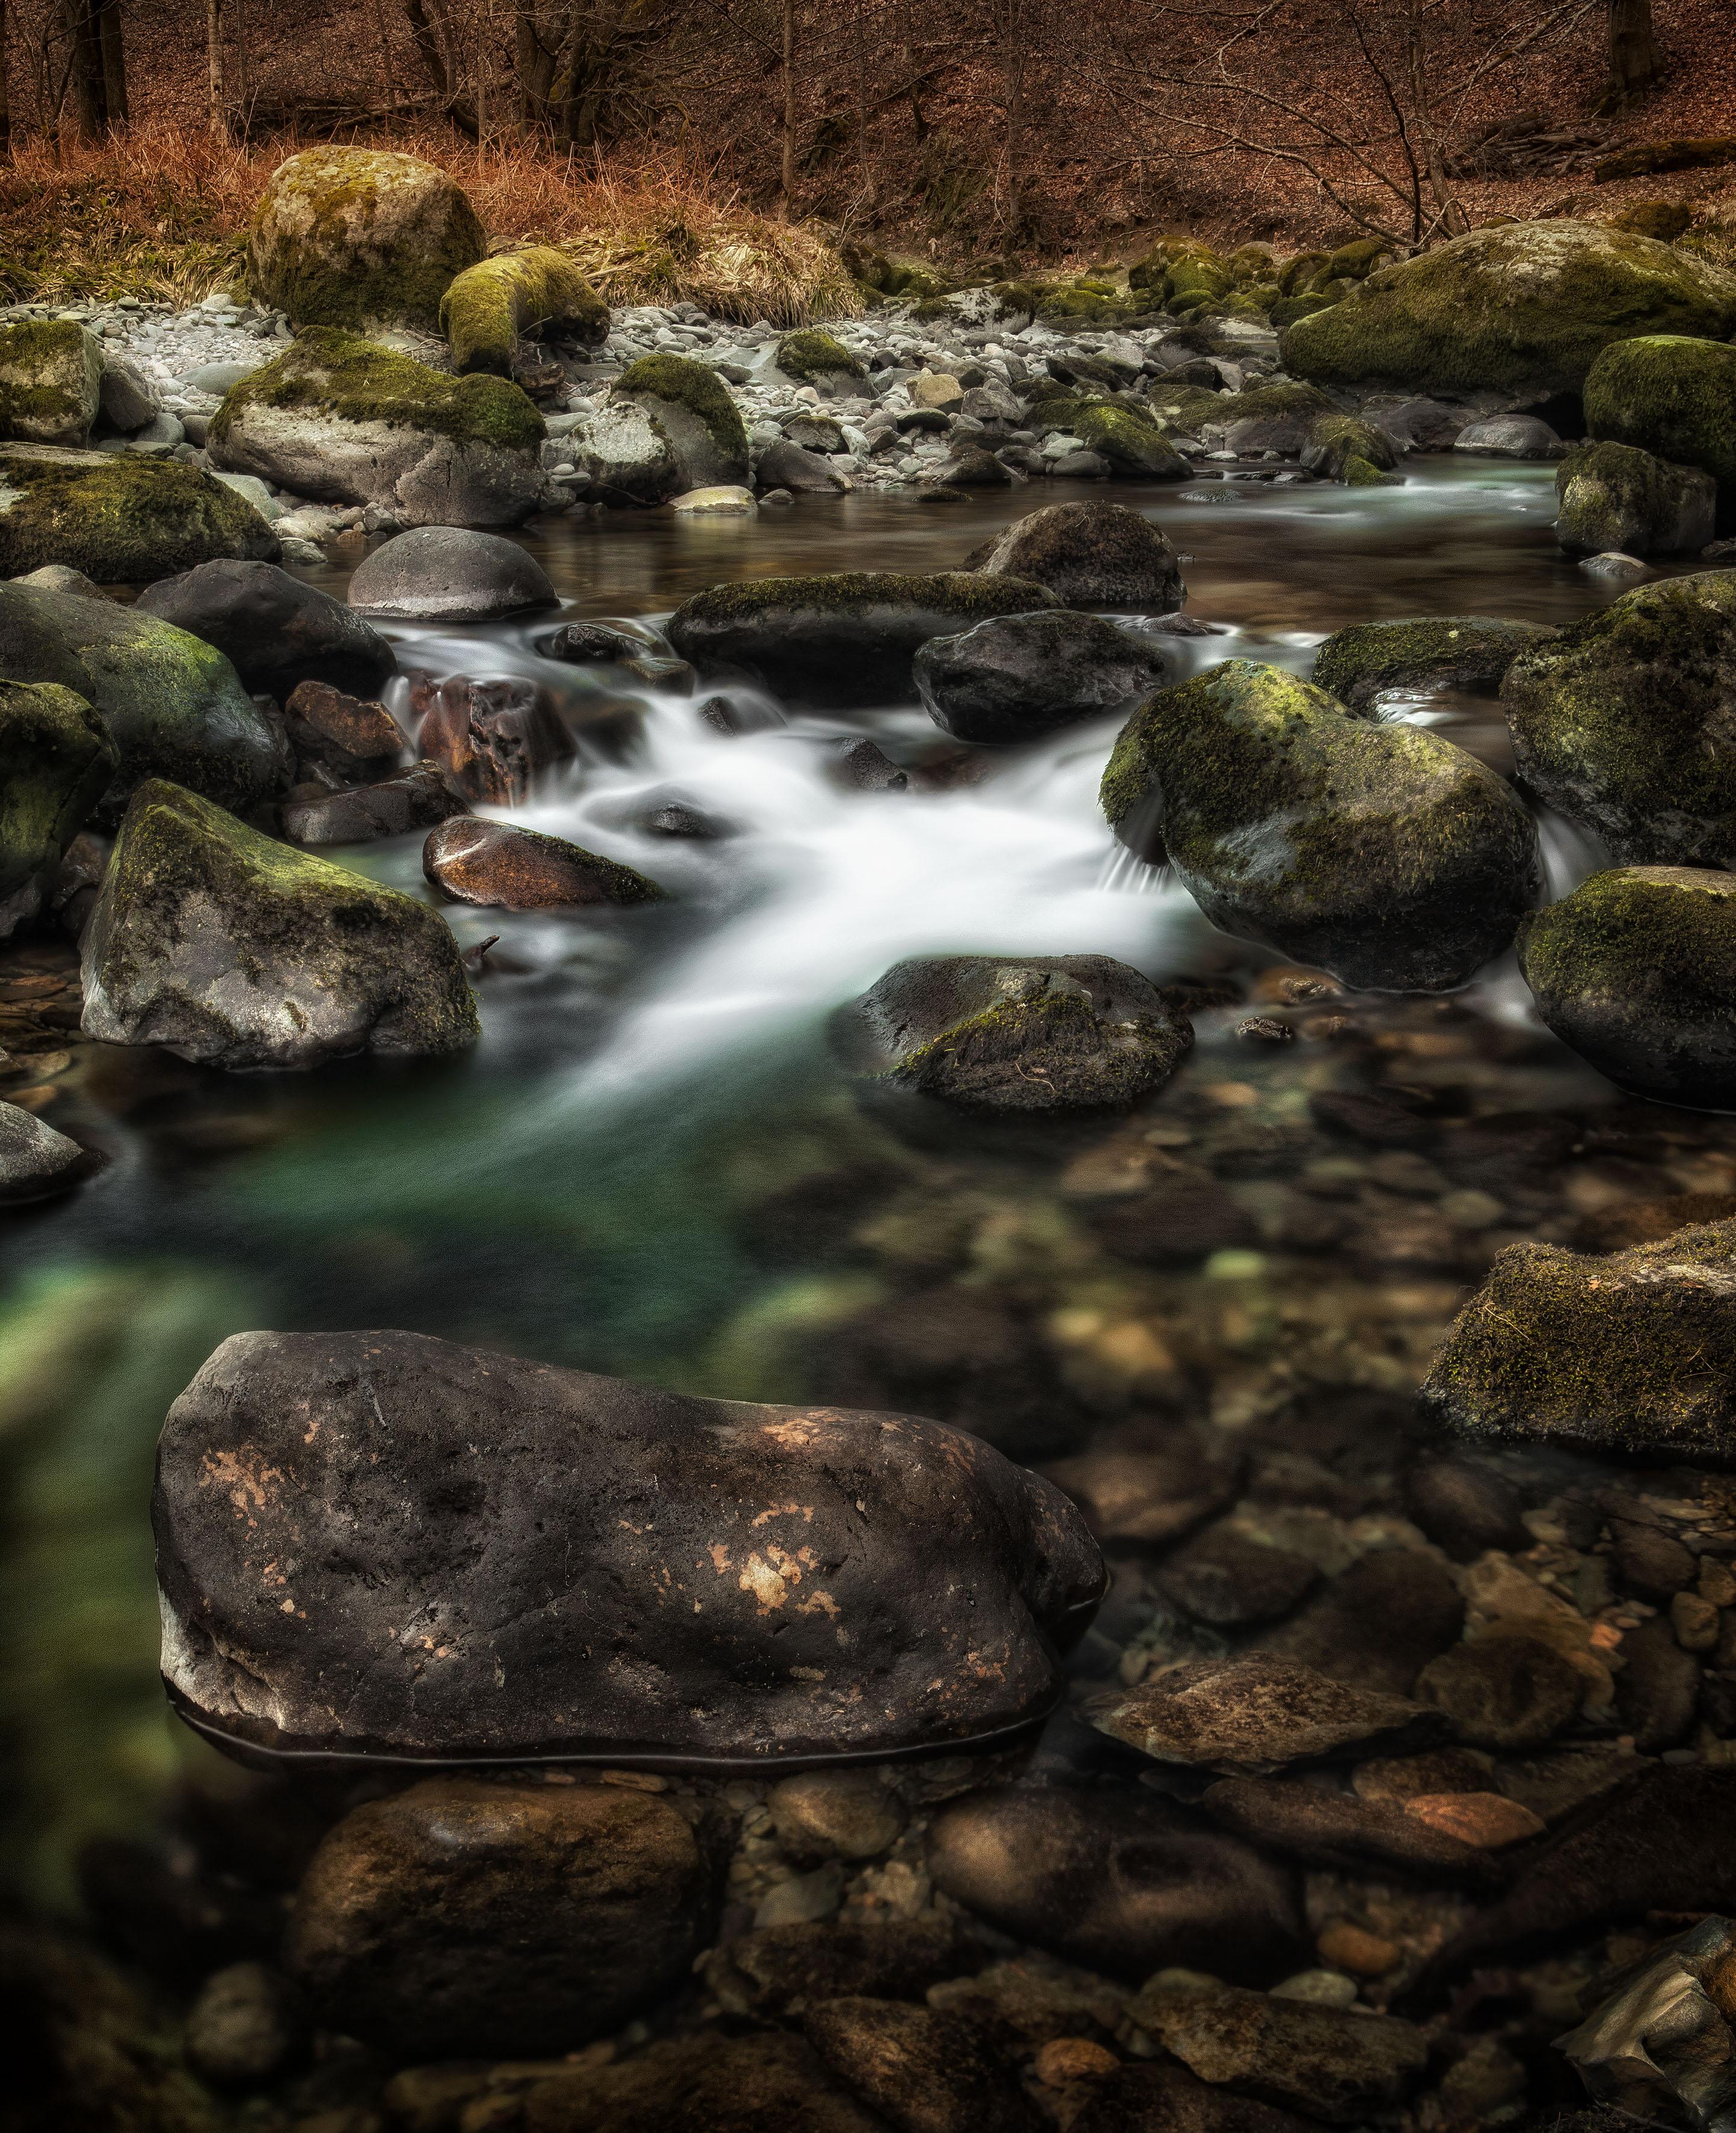 aira-force-river-lake-district-england